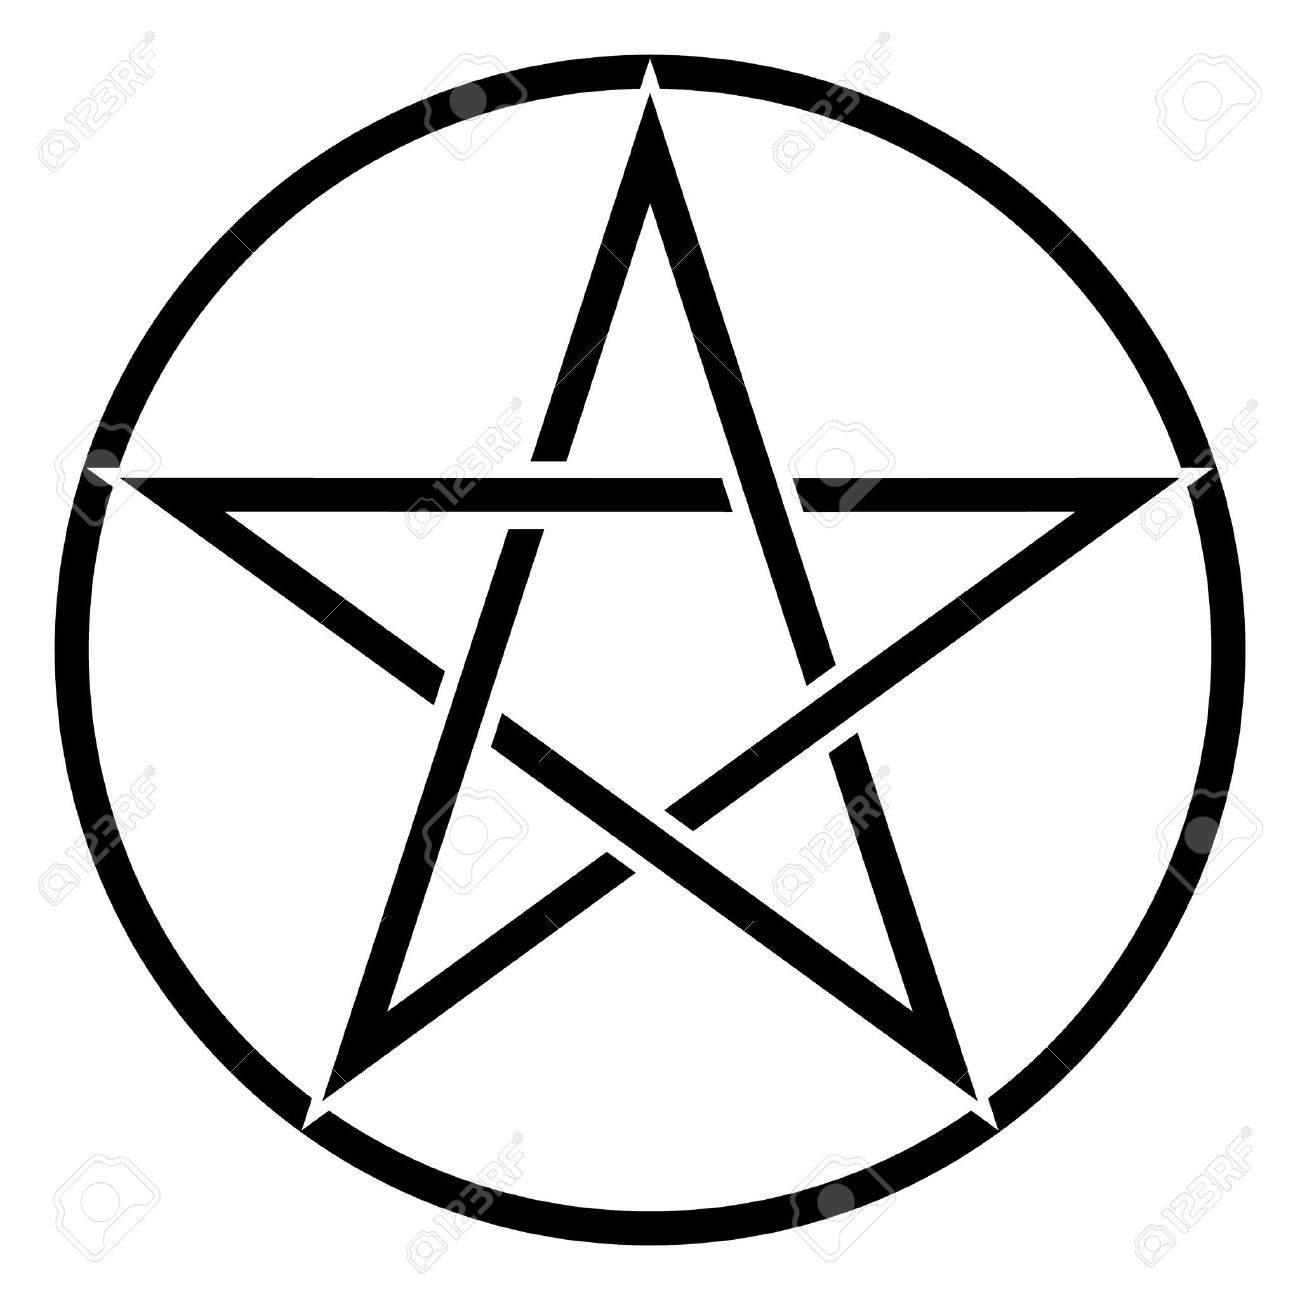 pentagram symbol royalty free cliparts vectors and stock rh 123rf com pentagram vector art pentagram vector art